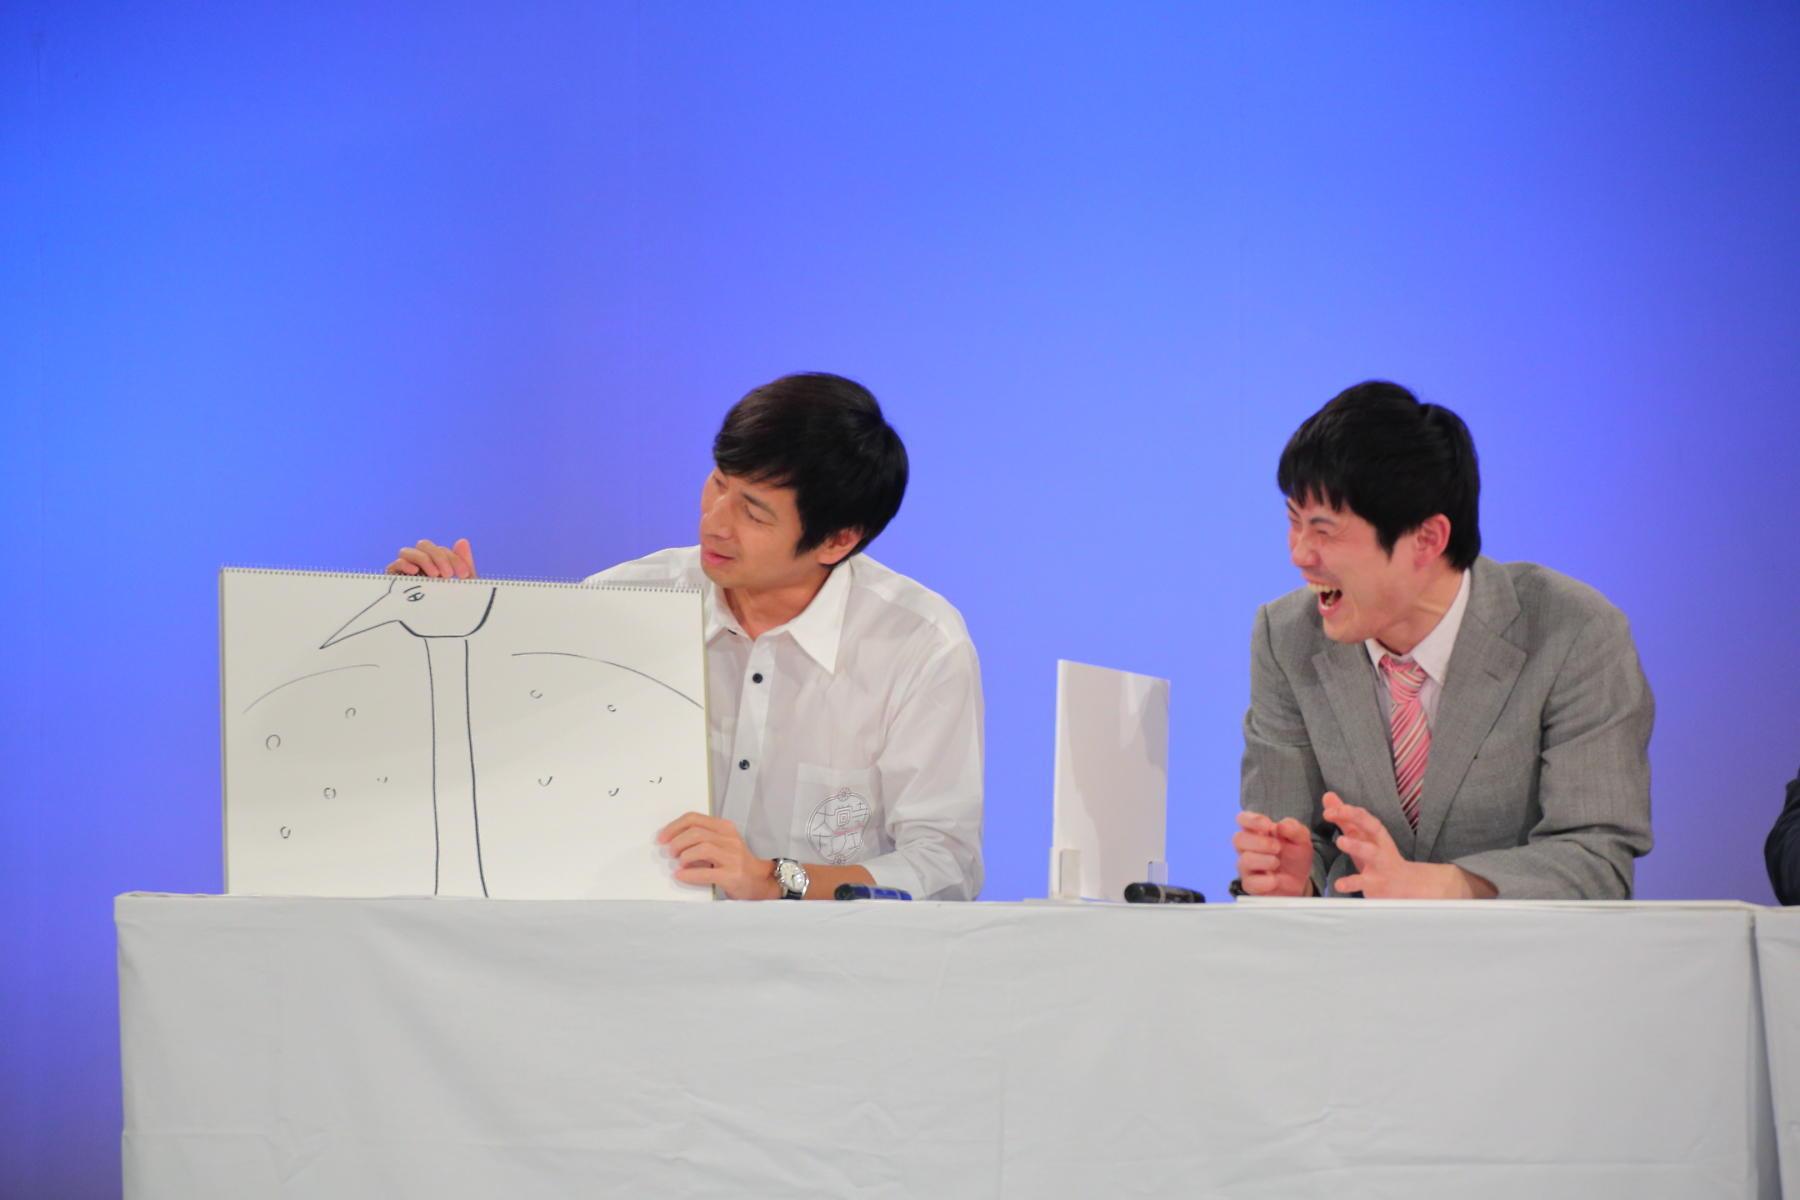 http://news.yoshimoto.co.jp/20170316063540-10a1e11955398f0de80ec899ddf7c85849ebc21b.jpg